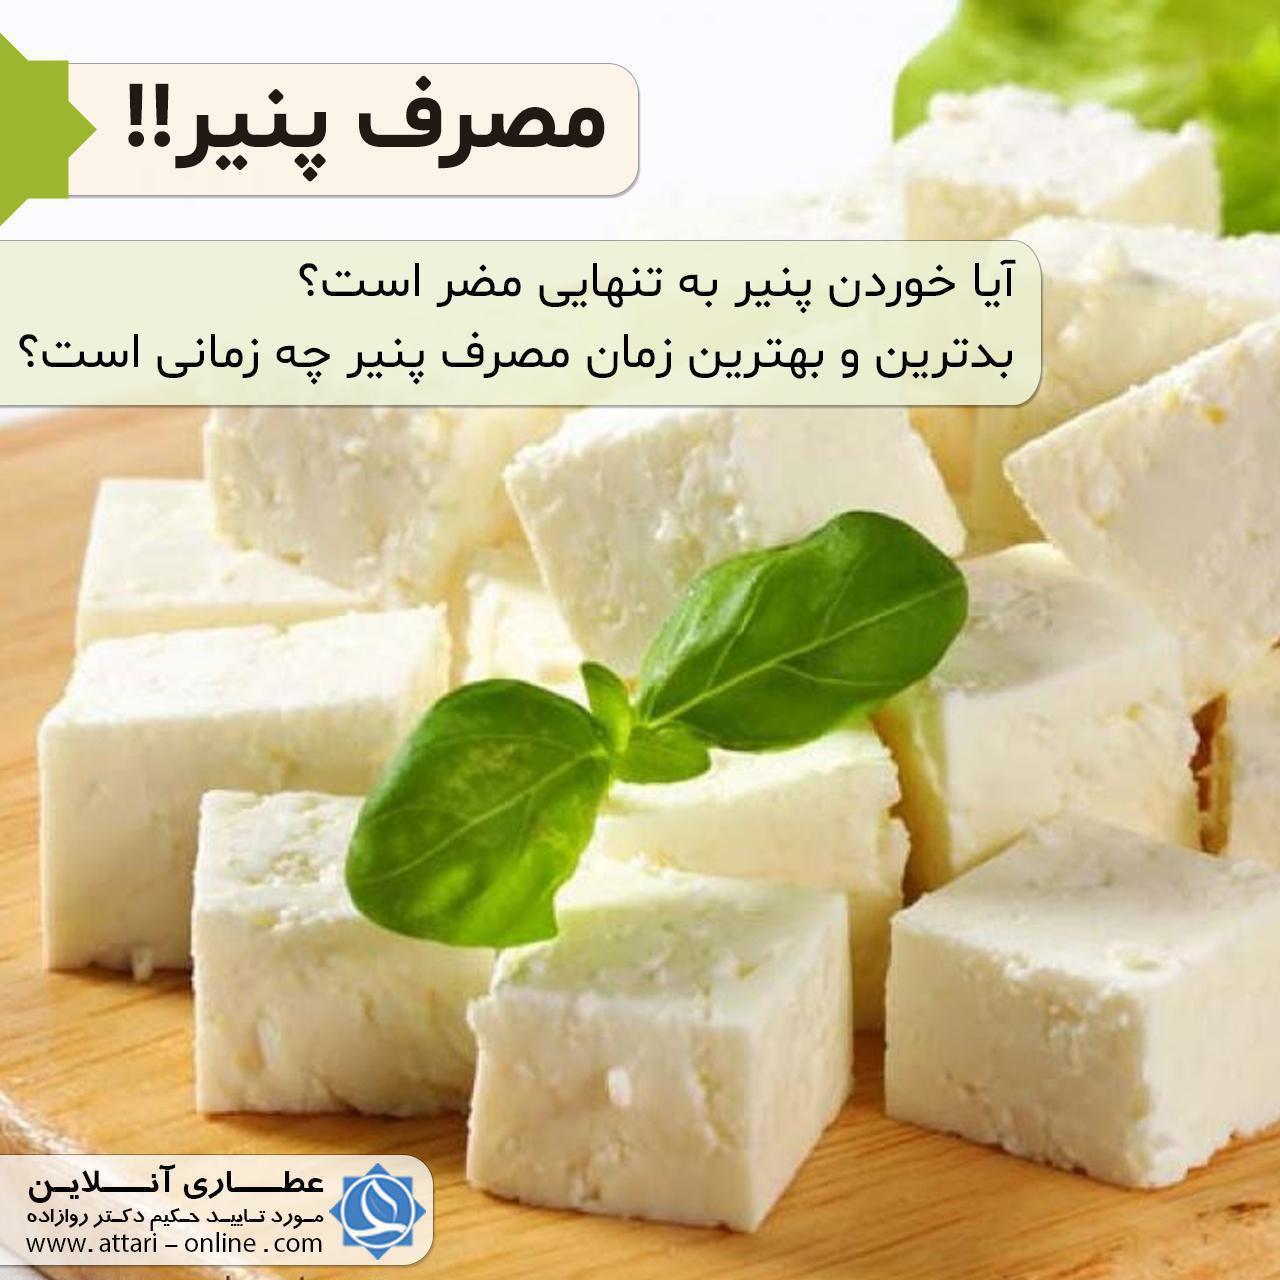 photo 2018 08 15 09 38 39 مصرف پنیر